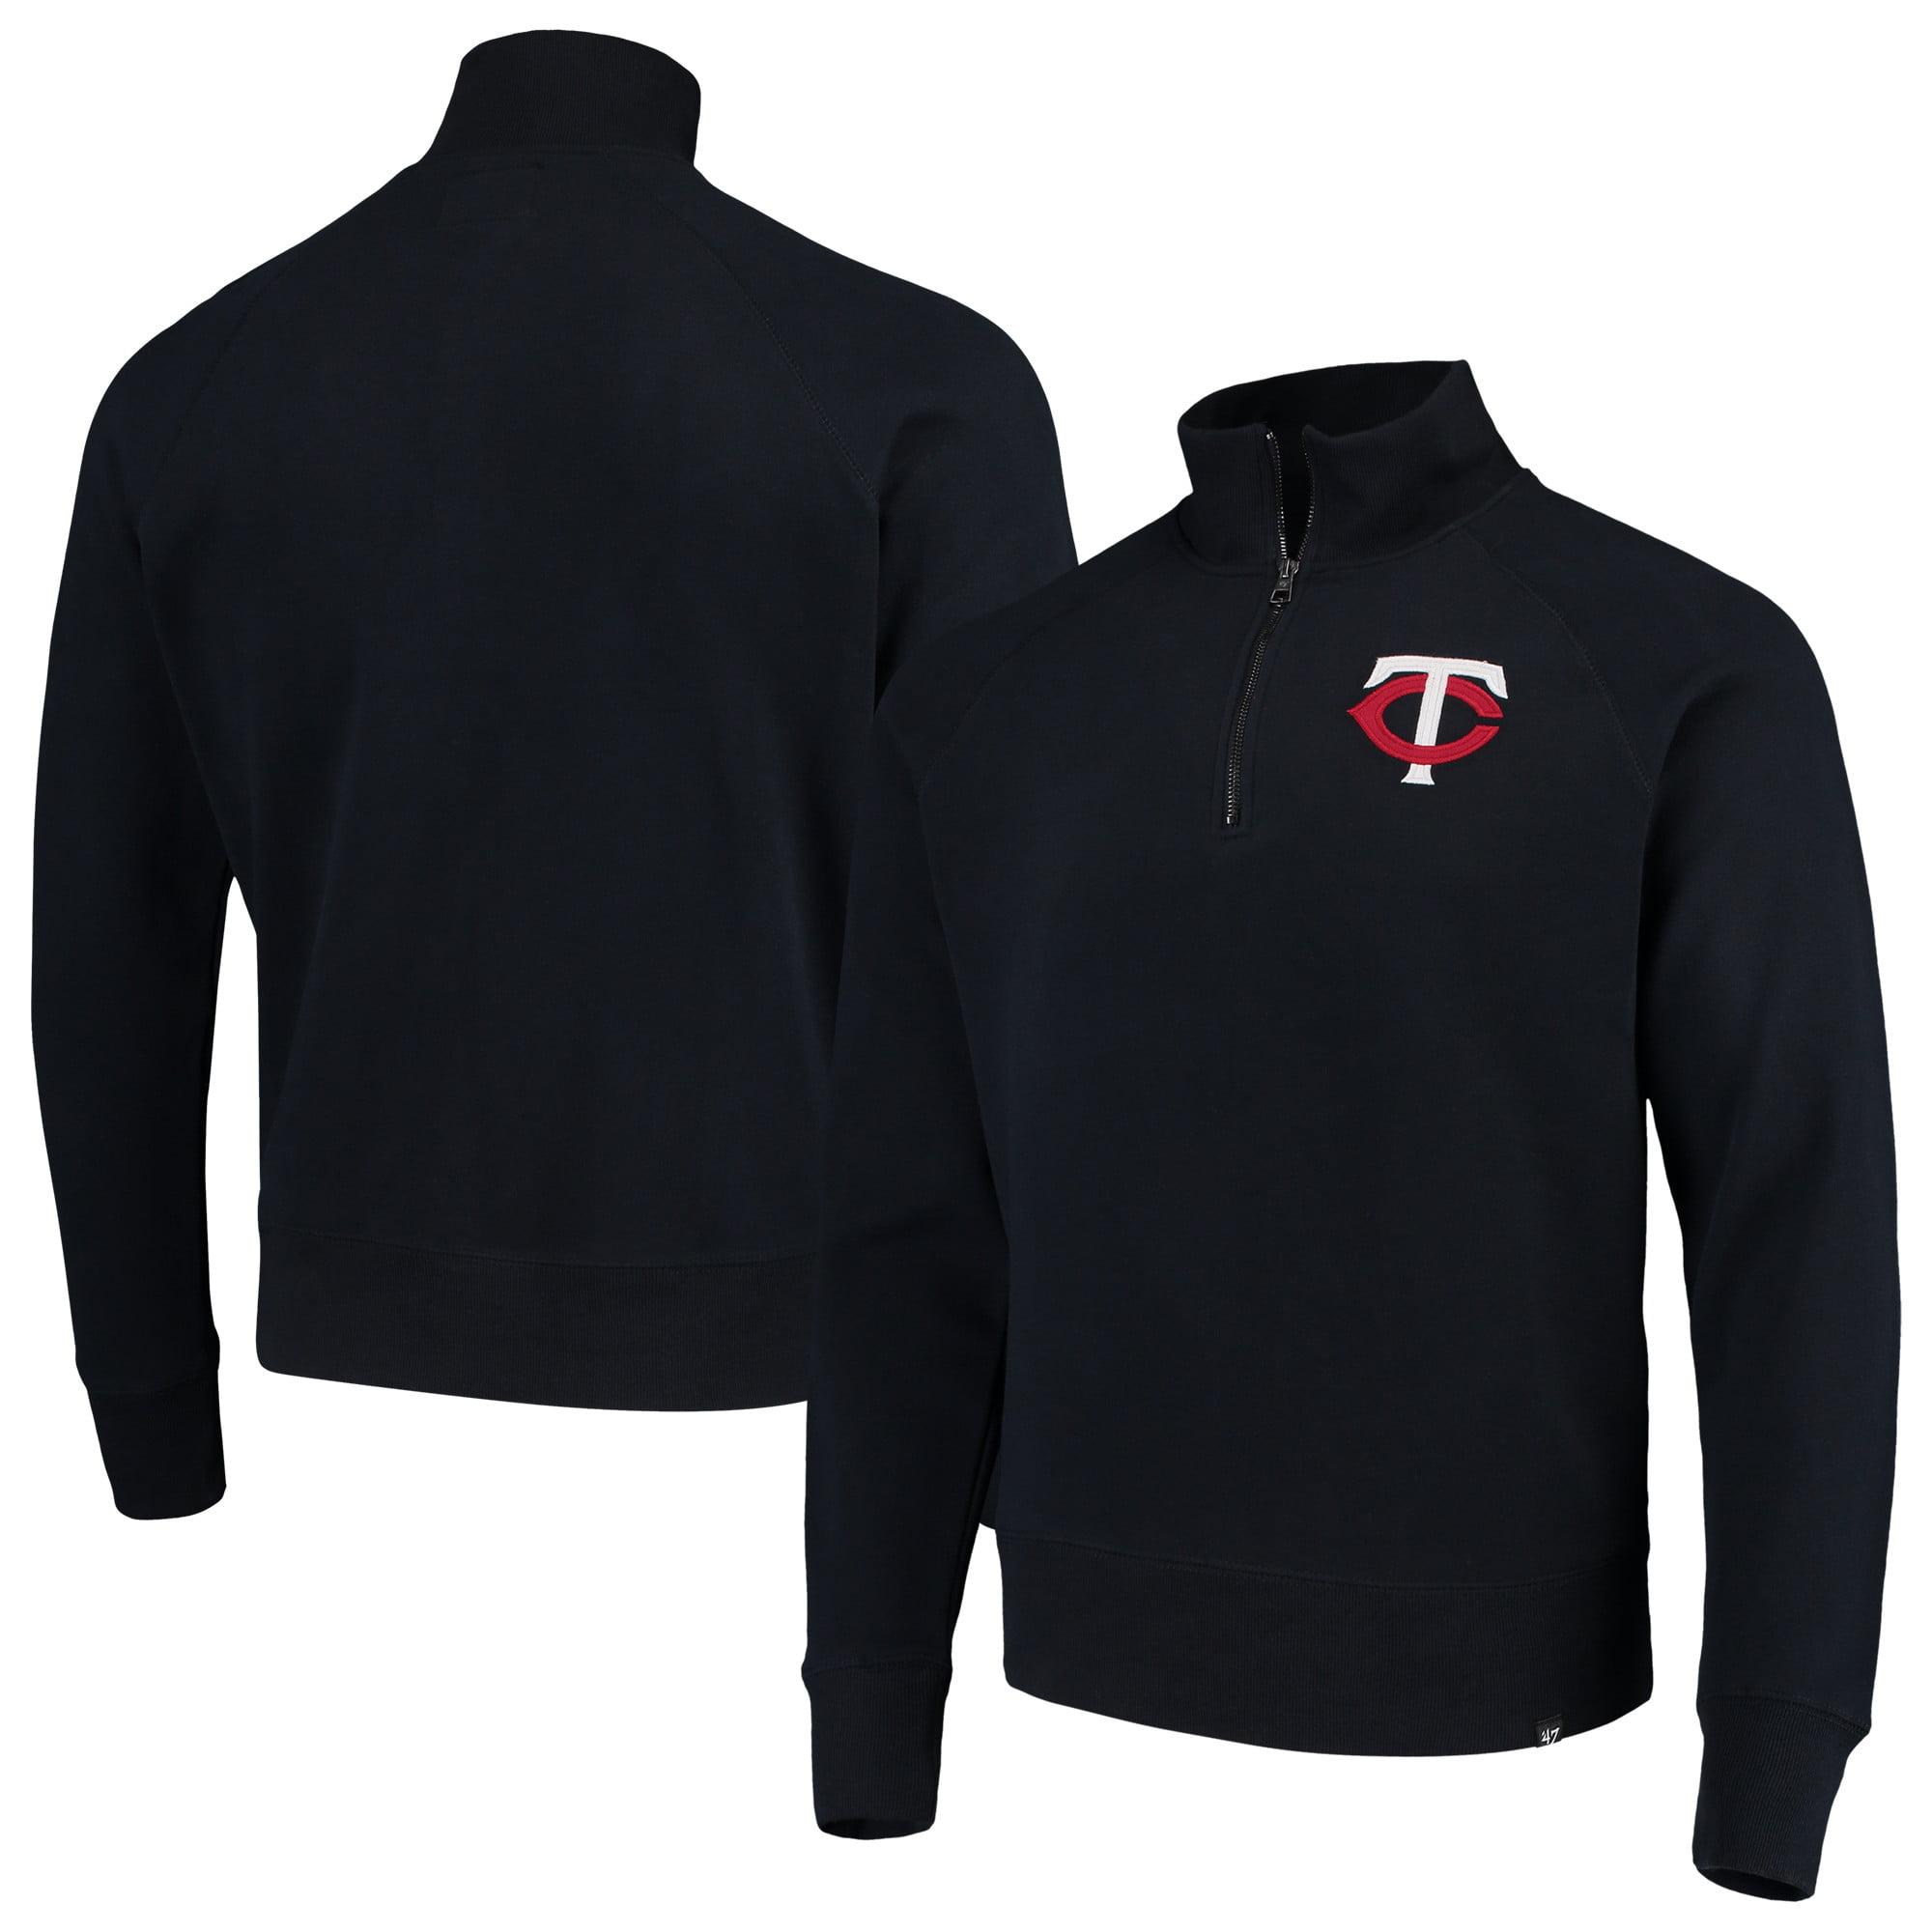 Minnesota Twins '47 MLB Headline Quarter-Zip Pullover Jacket - Navy